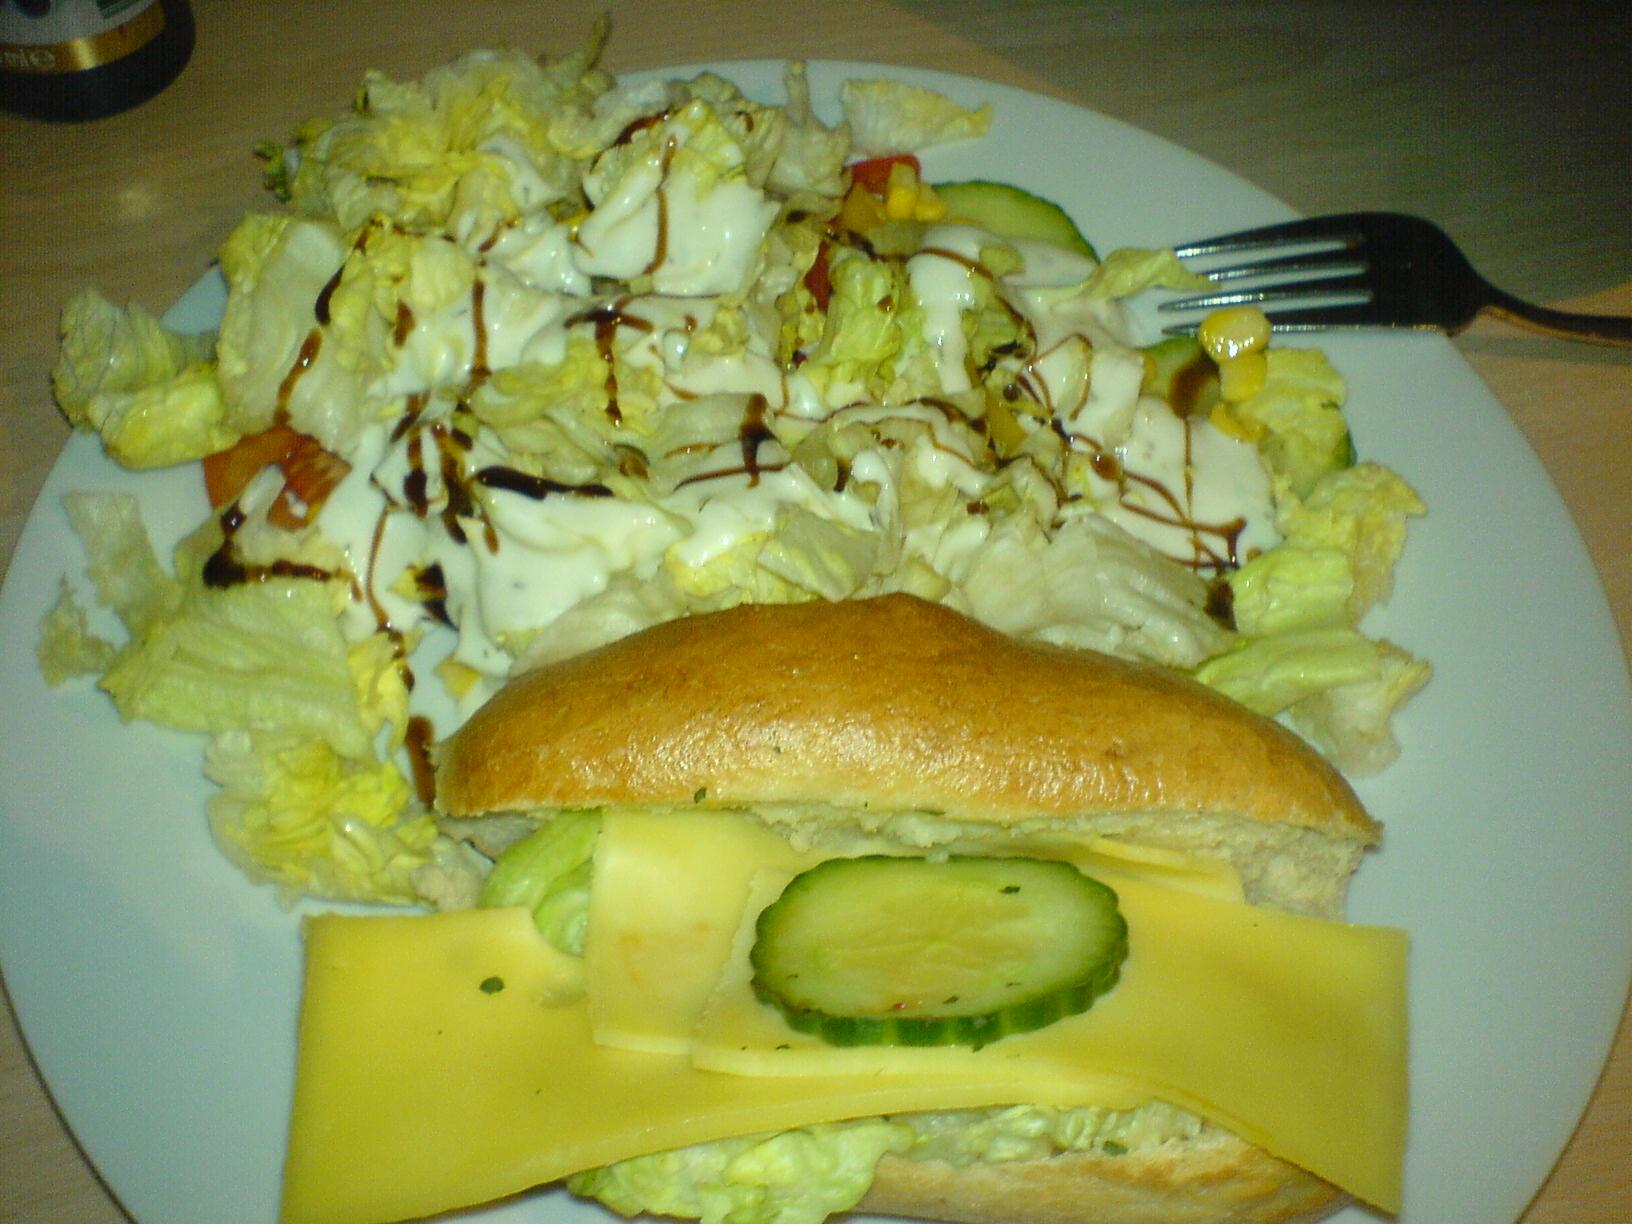 http://foodloader.net/Holz_2009-01-15_Kaesebroetchen_mit_Salat.jpg